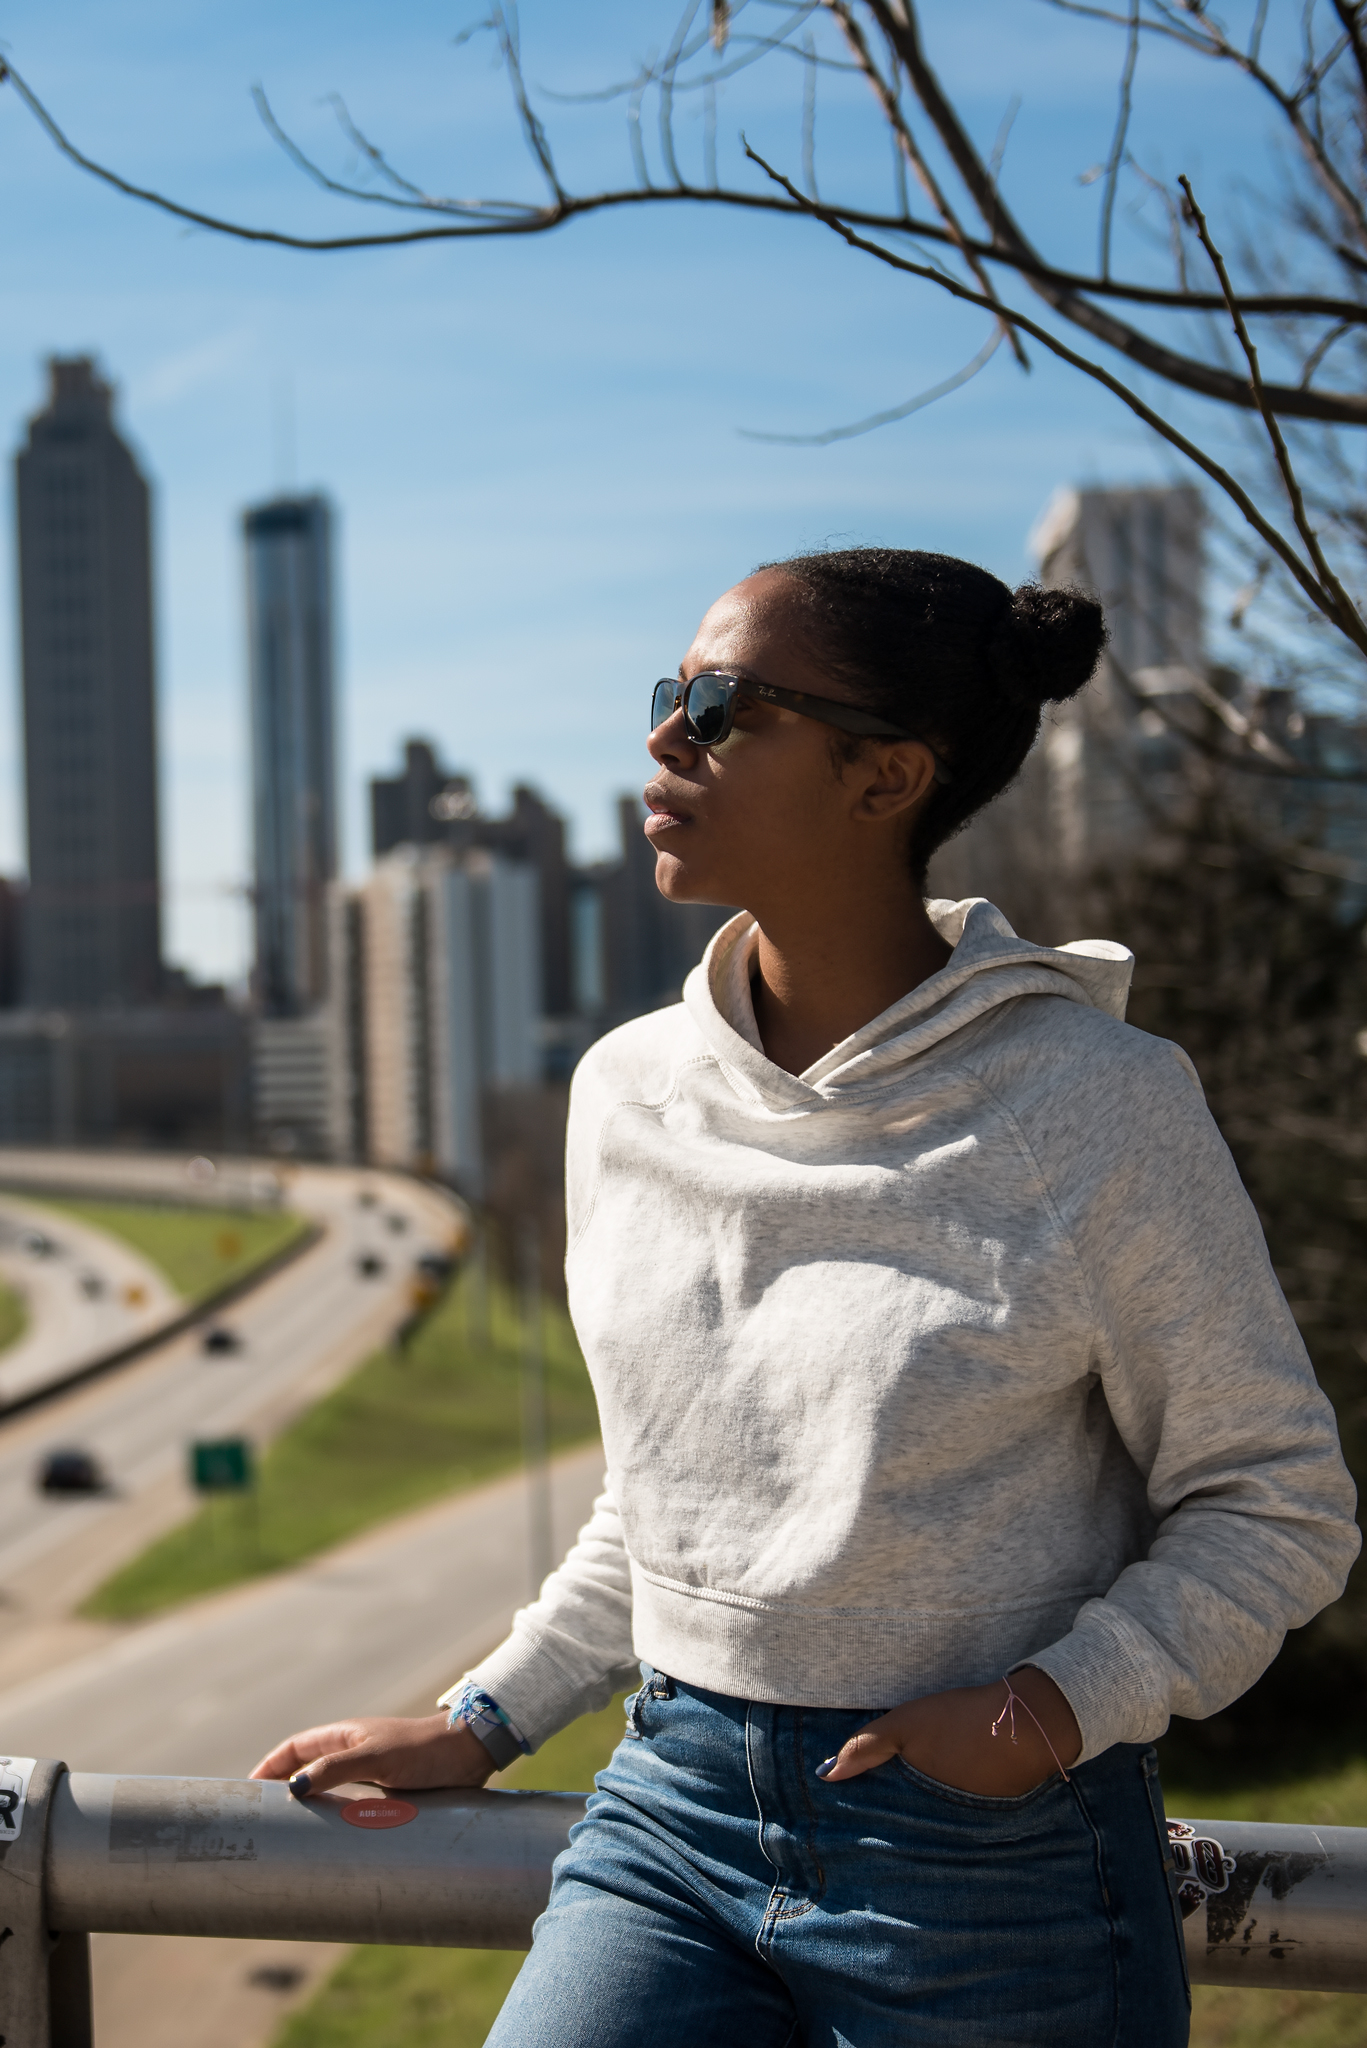 Photoshooting in Atlanta